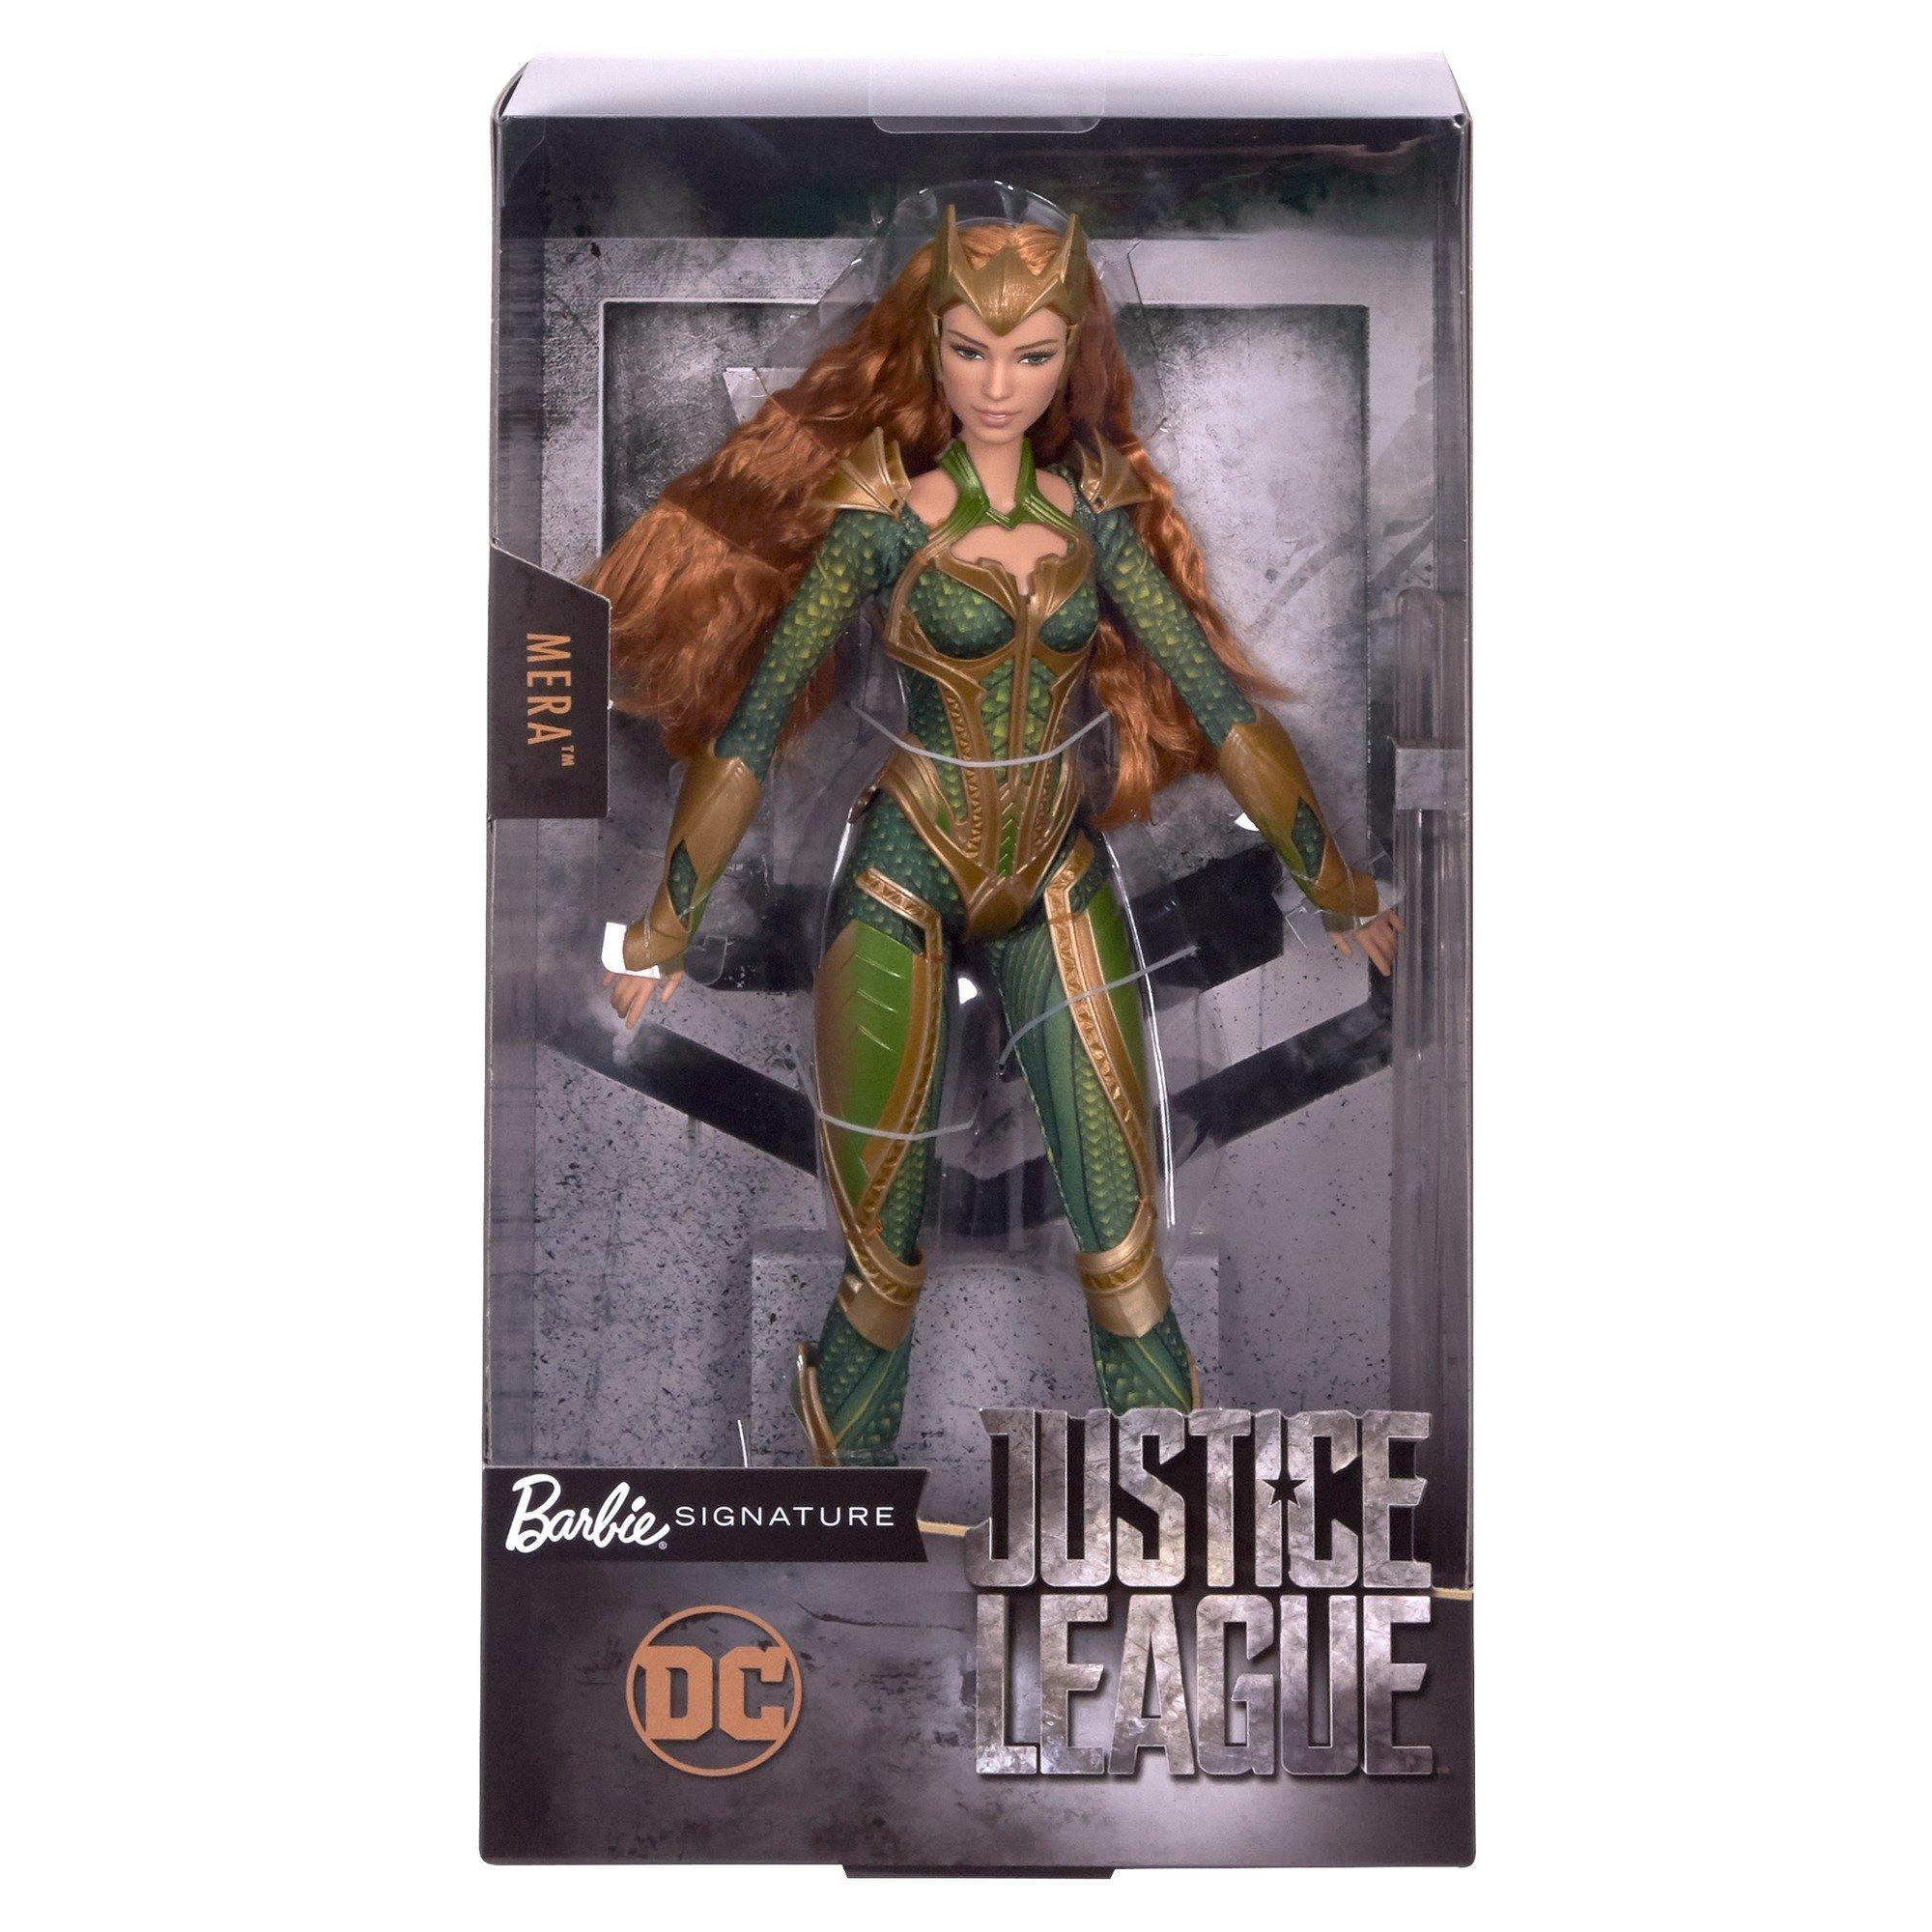 BARBIE DC SIGNATURE SERIES JUSTICE LEAGUE WONDER WOMAN DOLL